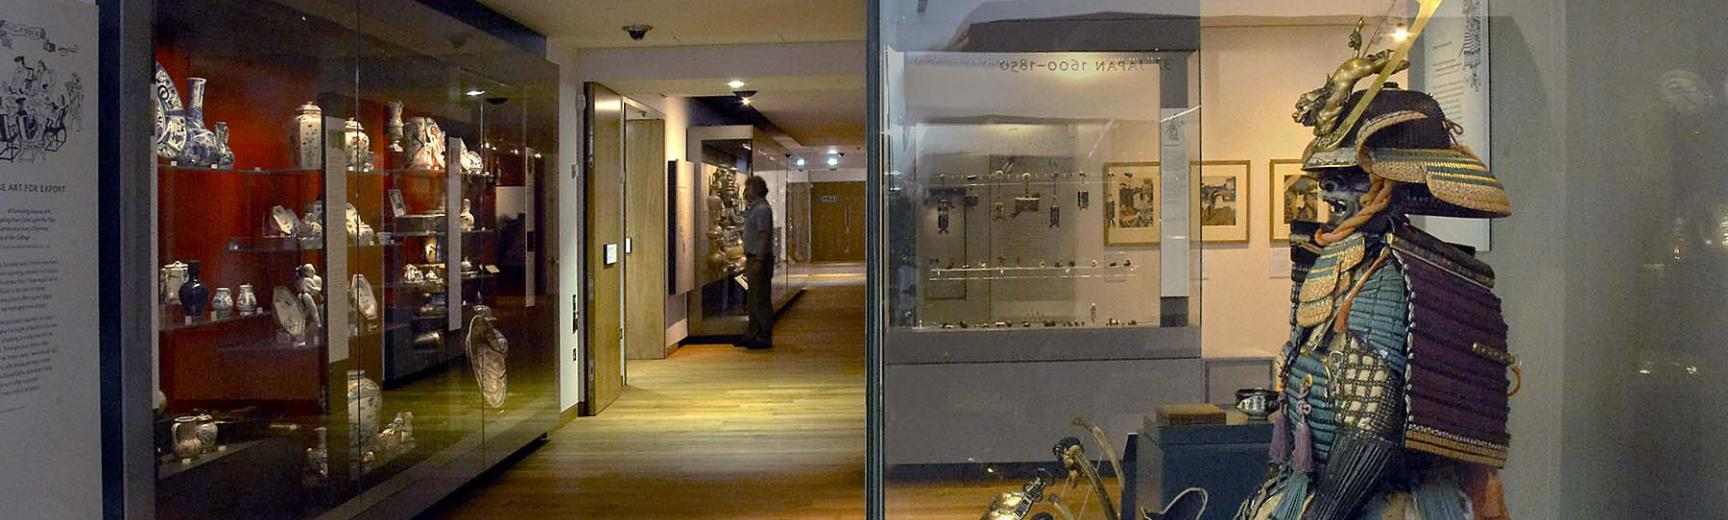 Japan Gallery at the Ashmolean Museum